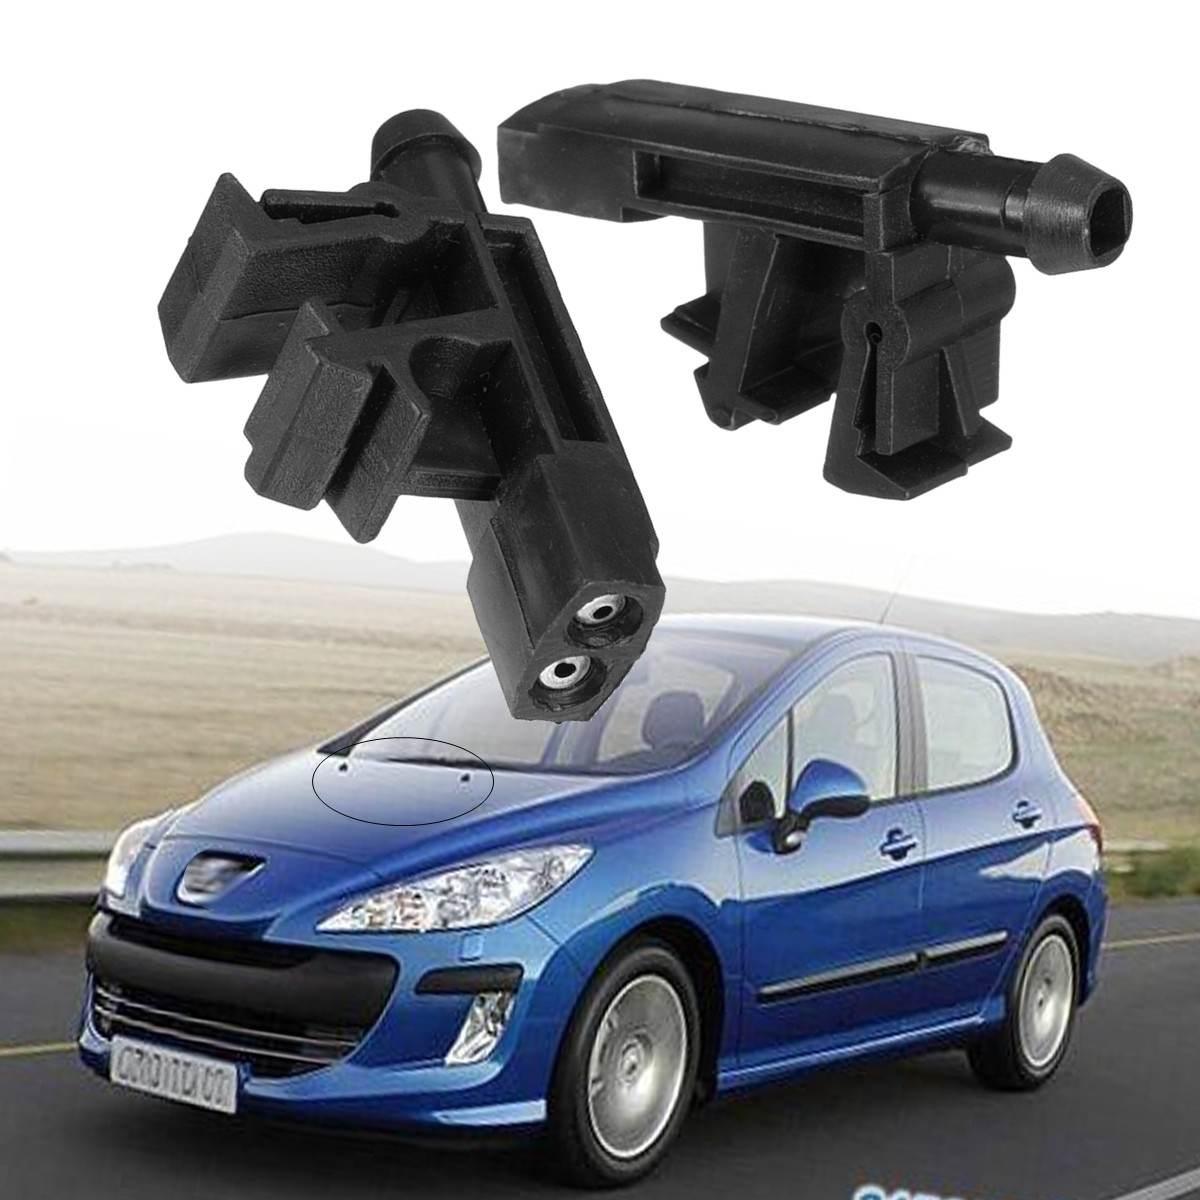 Par de boquillas limpiaparabrisas delantero, Izquierdo, derecho, para Peugeot Partner